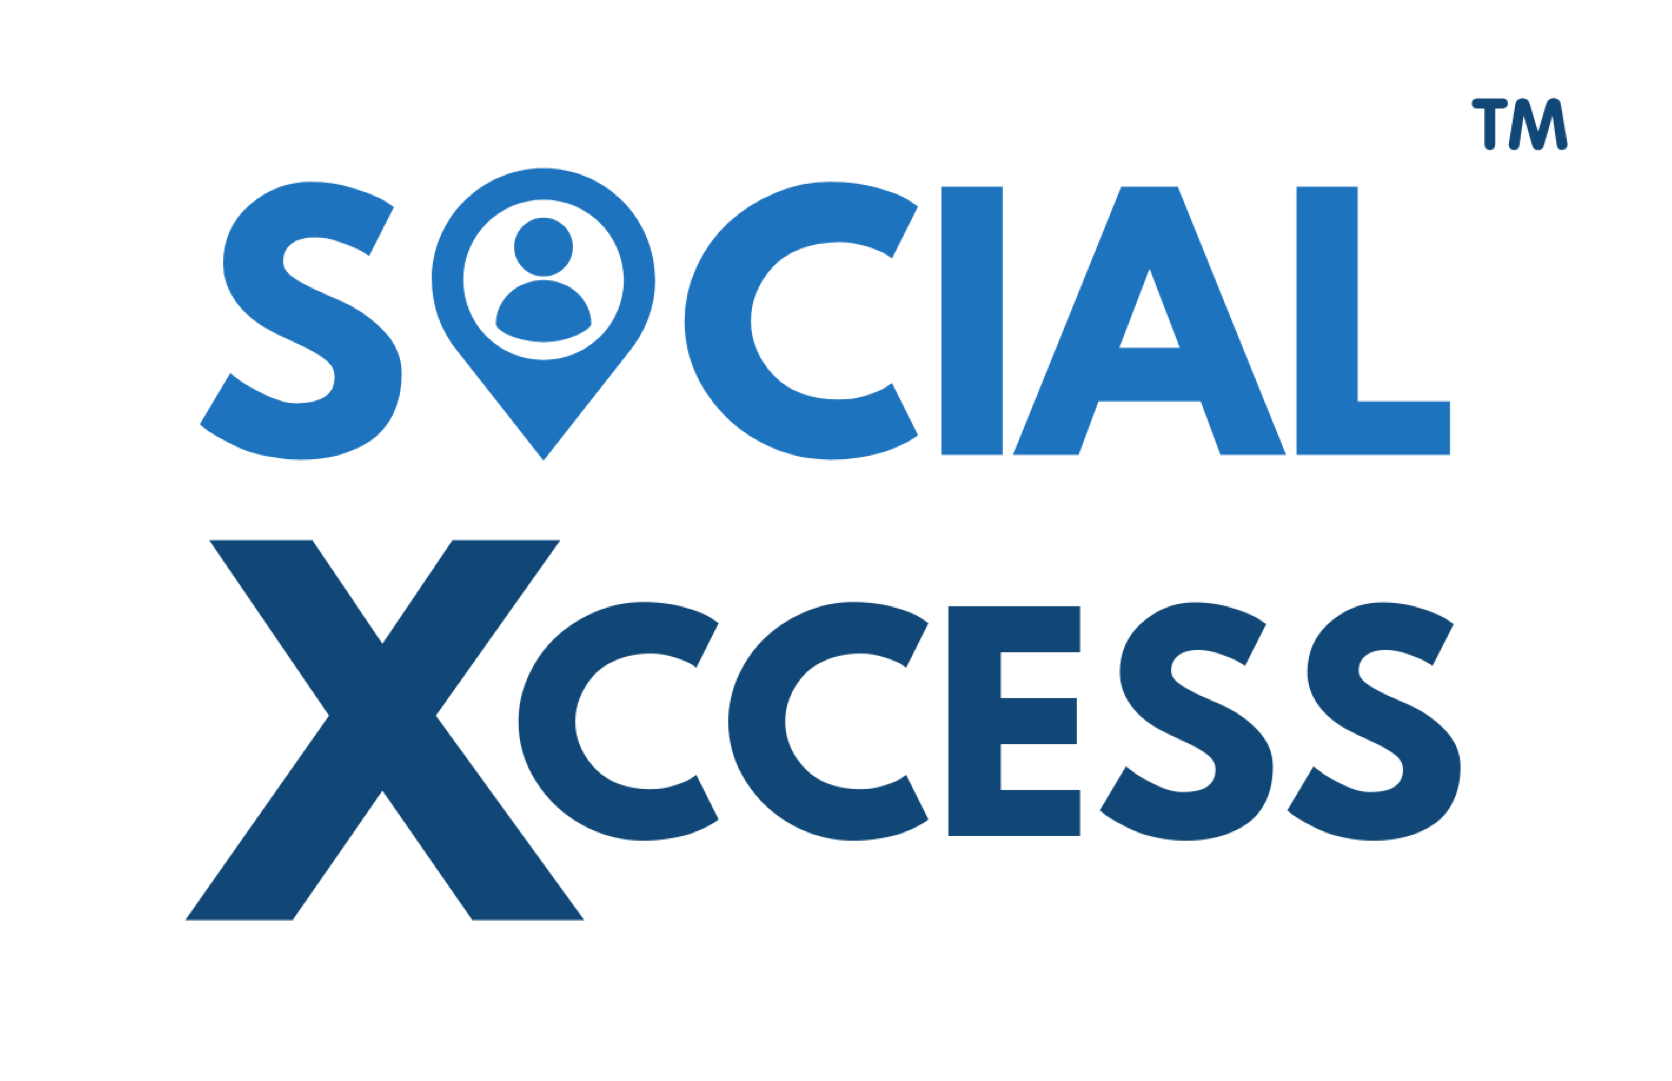 Social Xccess Logo